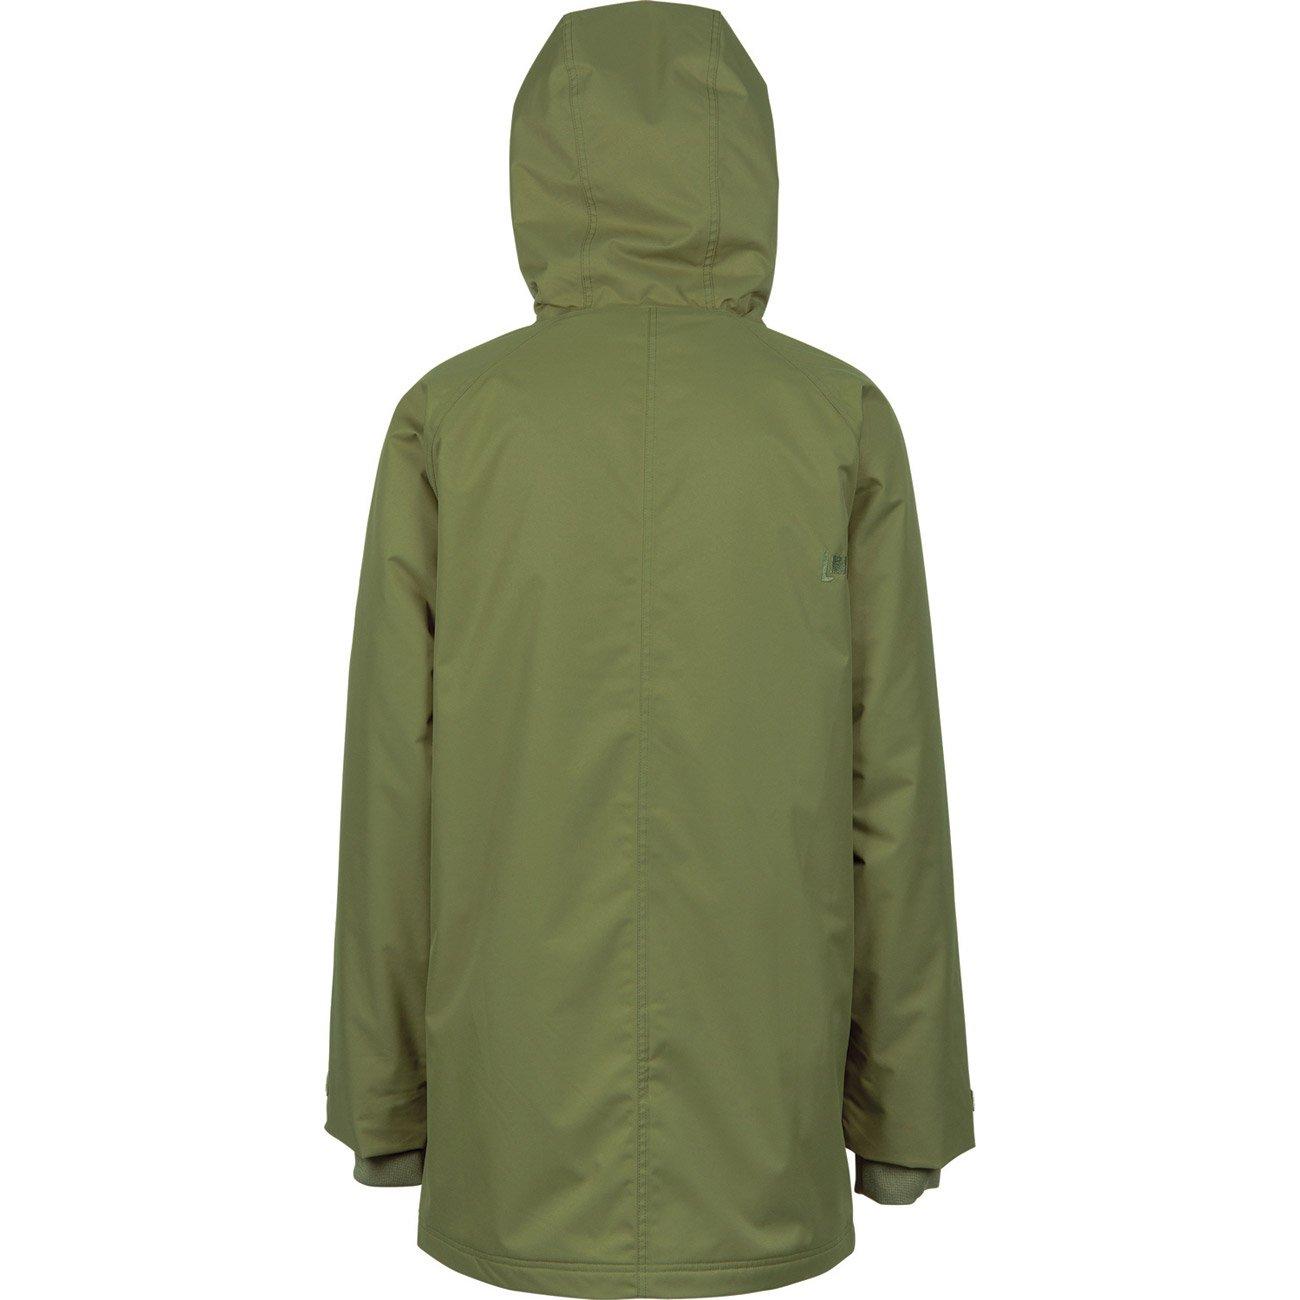 L1 Outerwear Grimey Chaqueta, Hombre, Military, L: Amazon.es: Deportes y aire libre